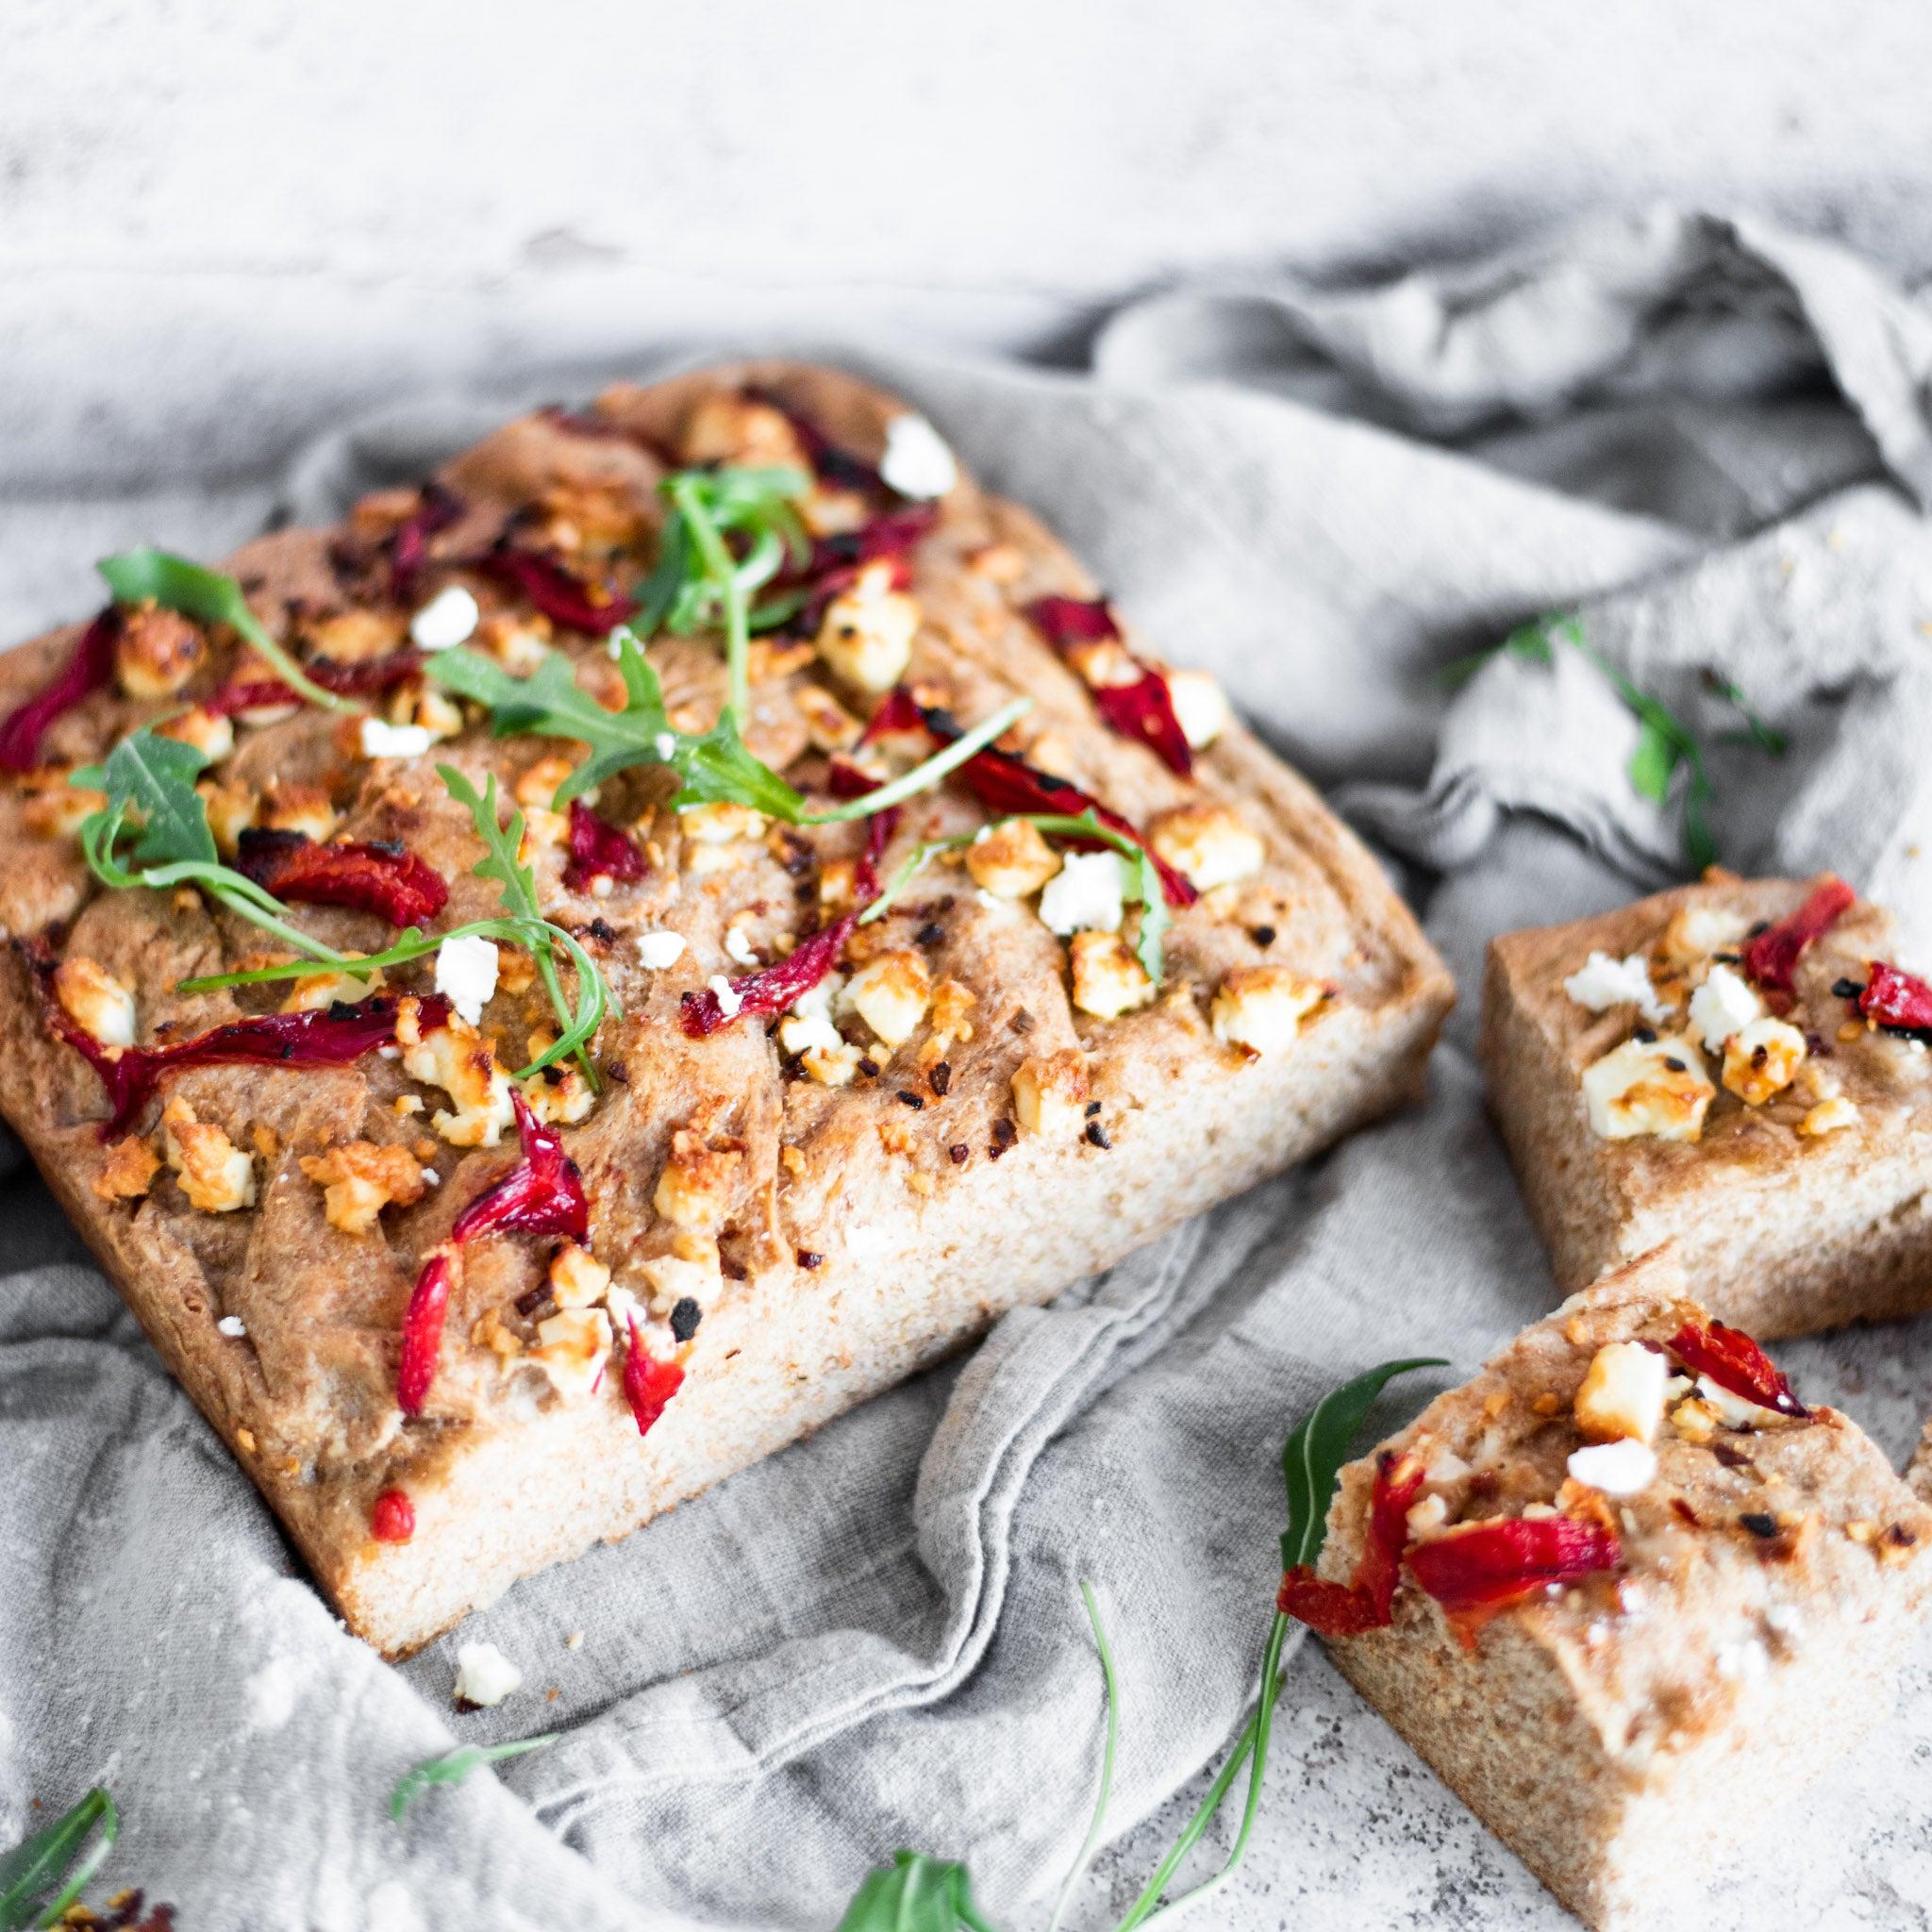 Chilli-Pepper-Feta-Bread-by-Allinson-s-(12).jpg